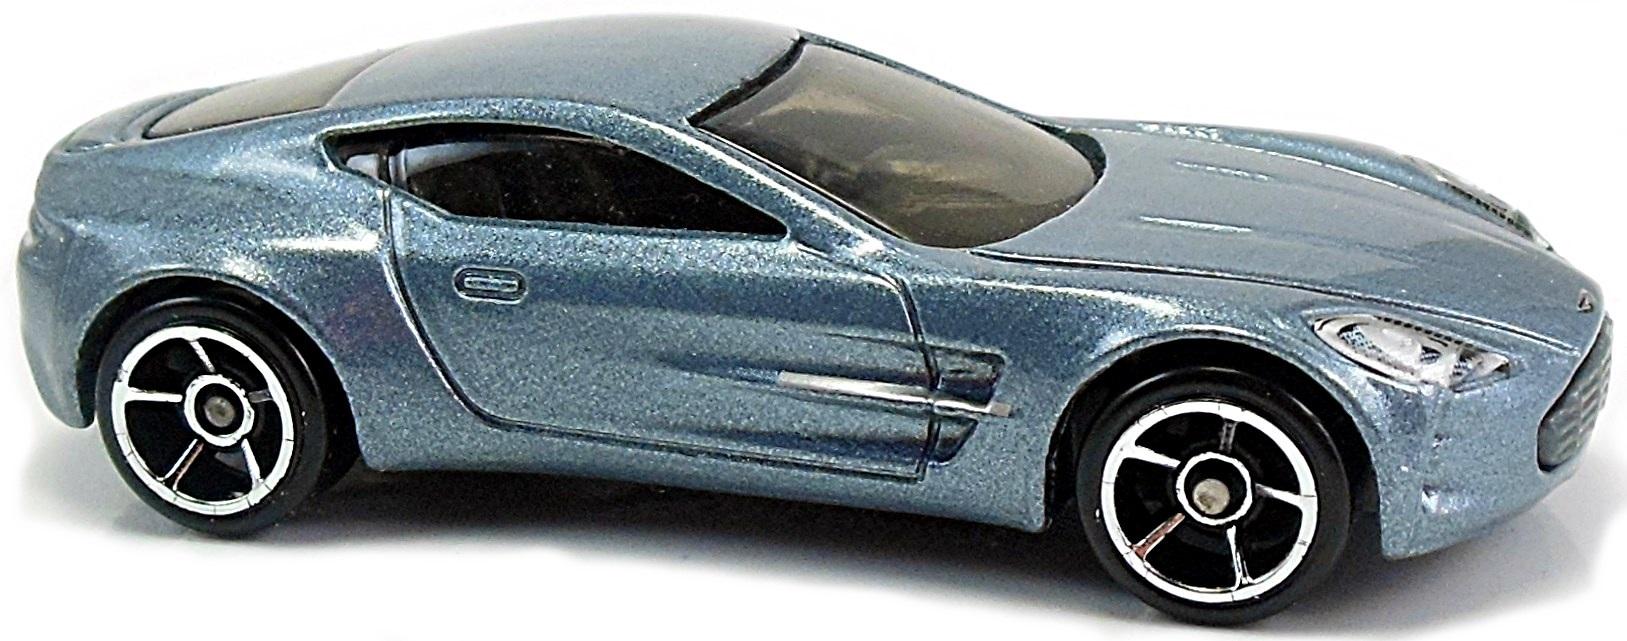 Aston Martin One 77 77mm 2011 Hot Wheels Newsletter